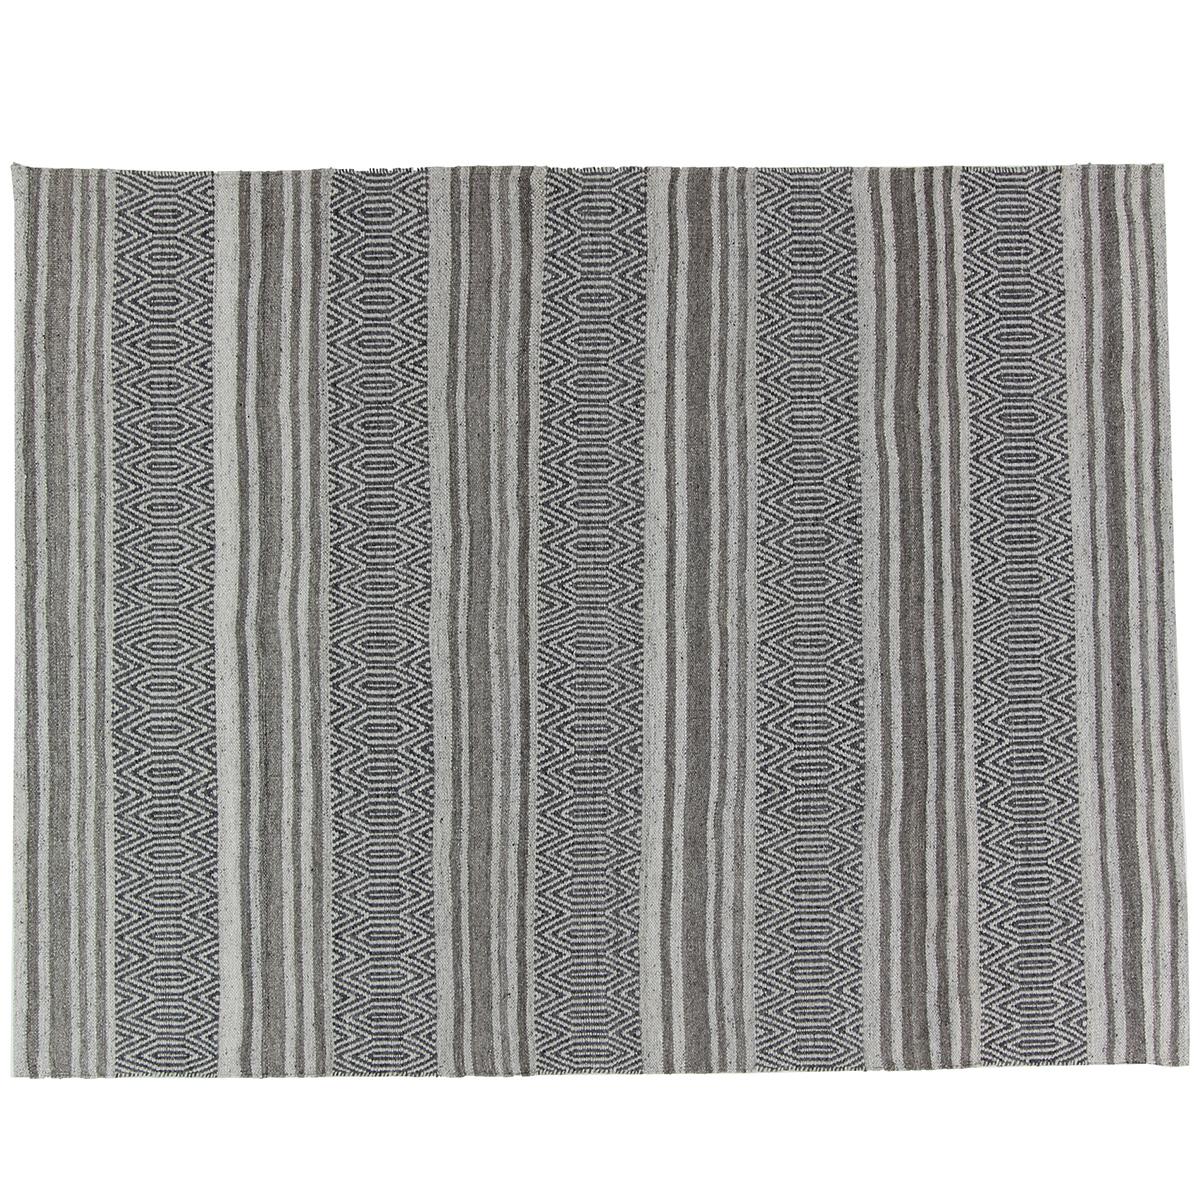 Vloerkleed Brinker Rain Grey | 200 x 290 cm